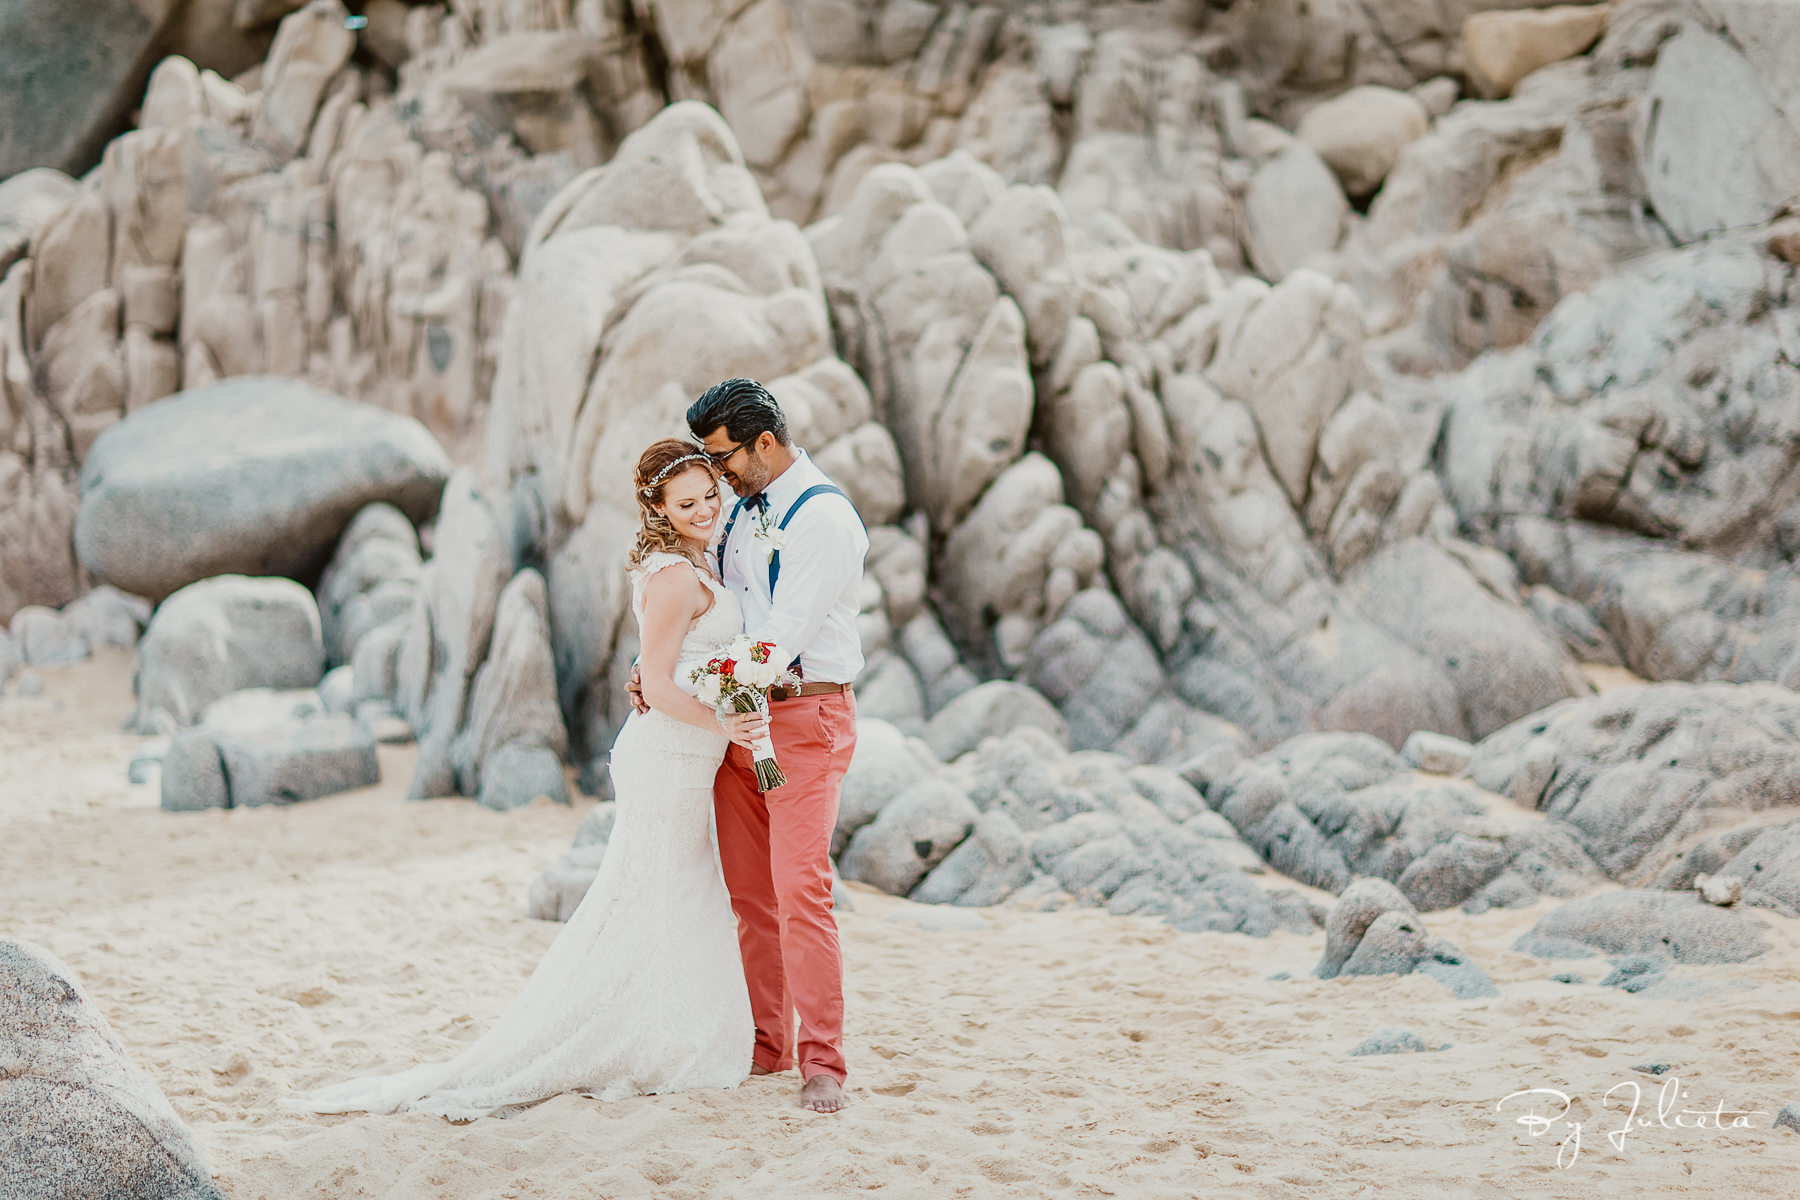 Los Tamarindos Wedding. D+L. Julieta Amezcua Photography. (7 of 25).jpg